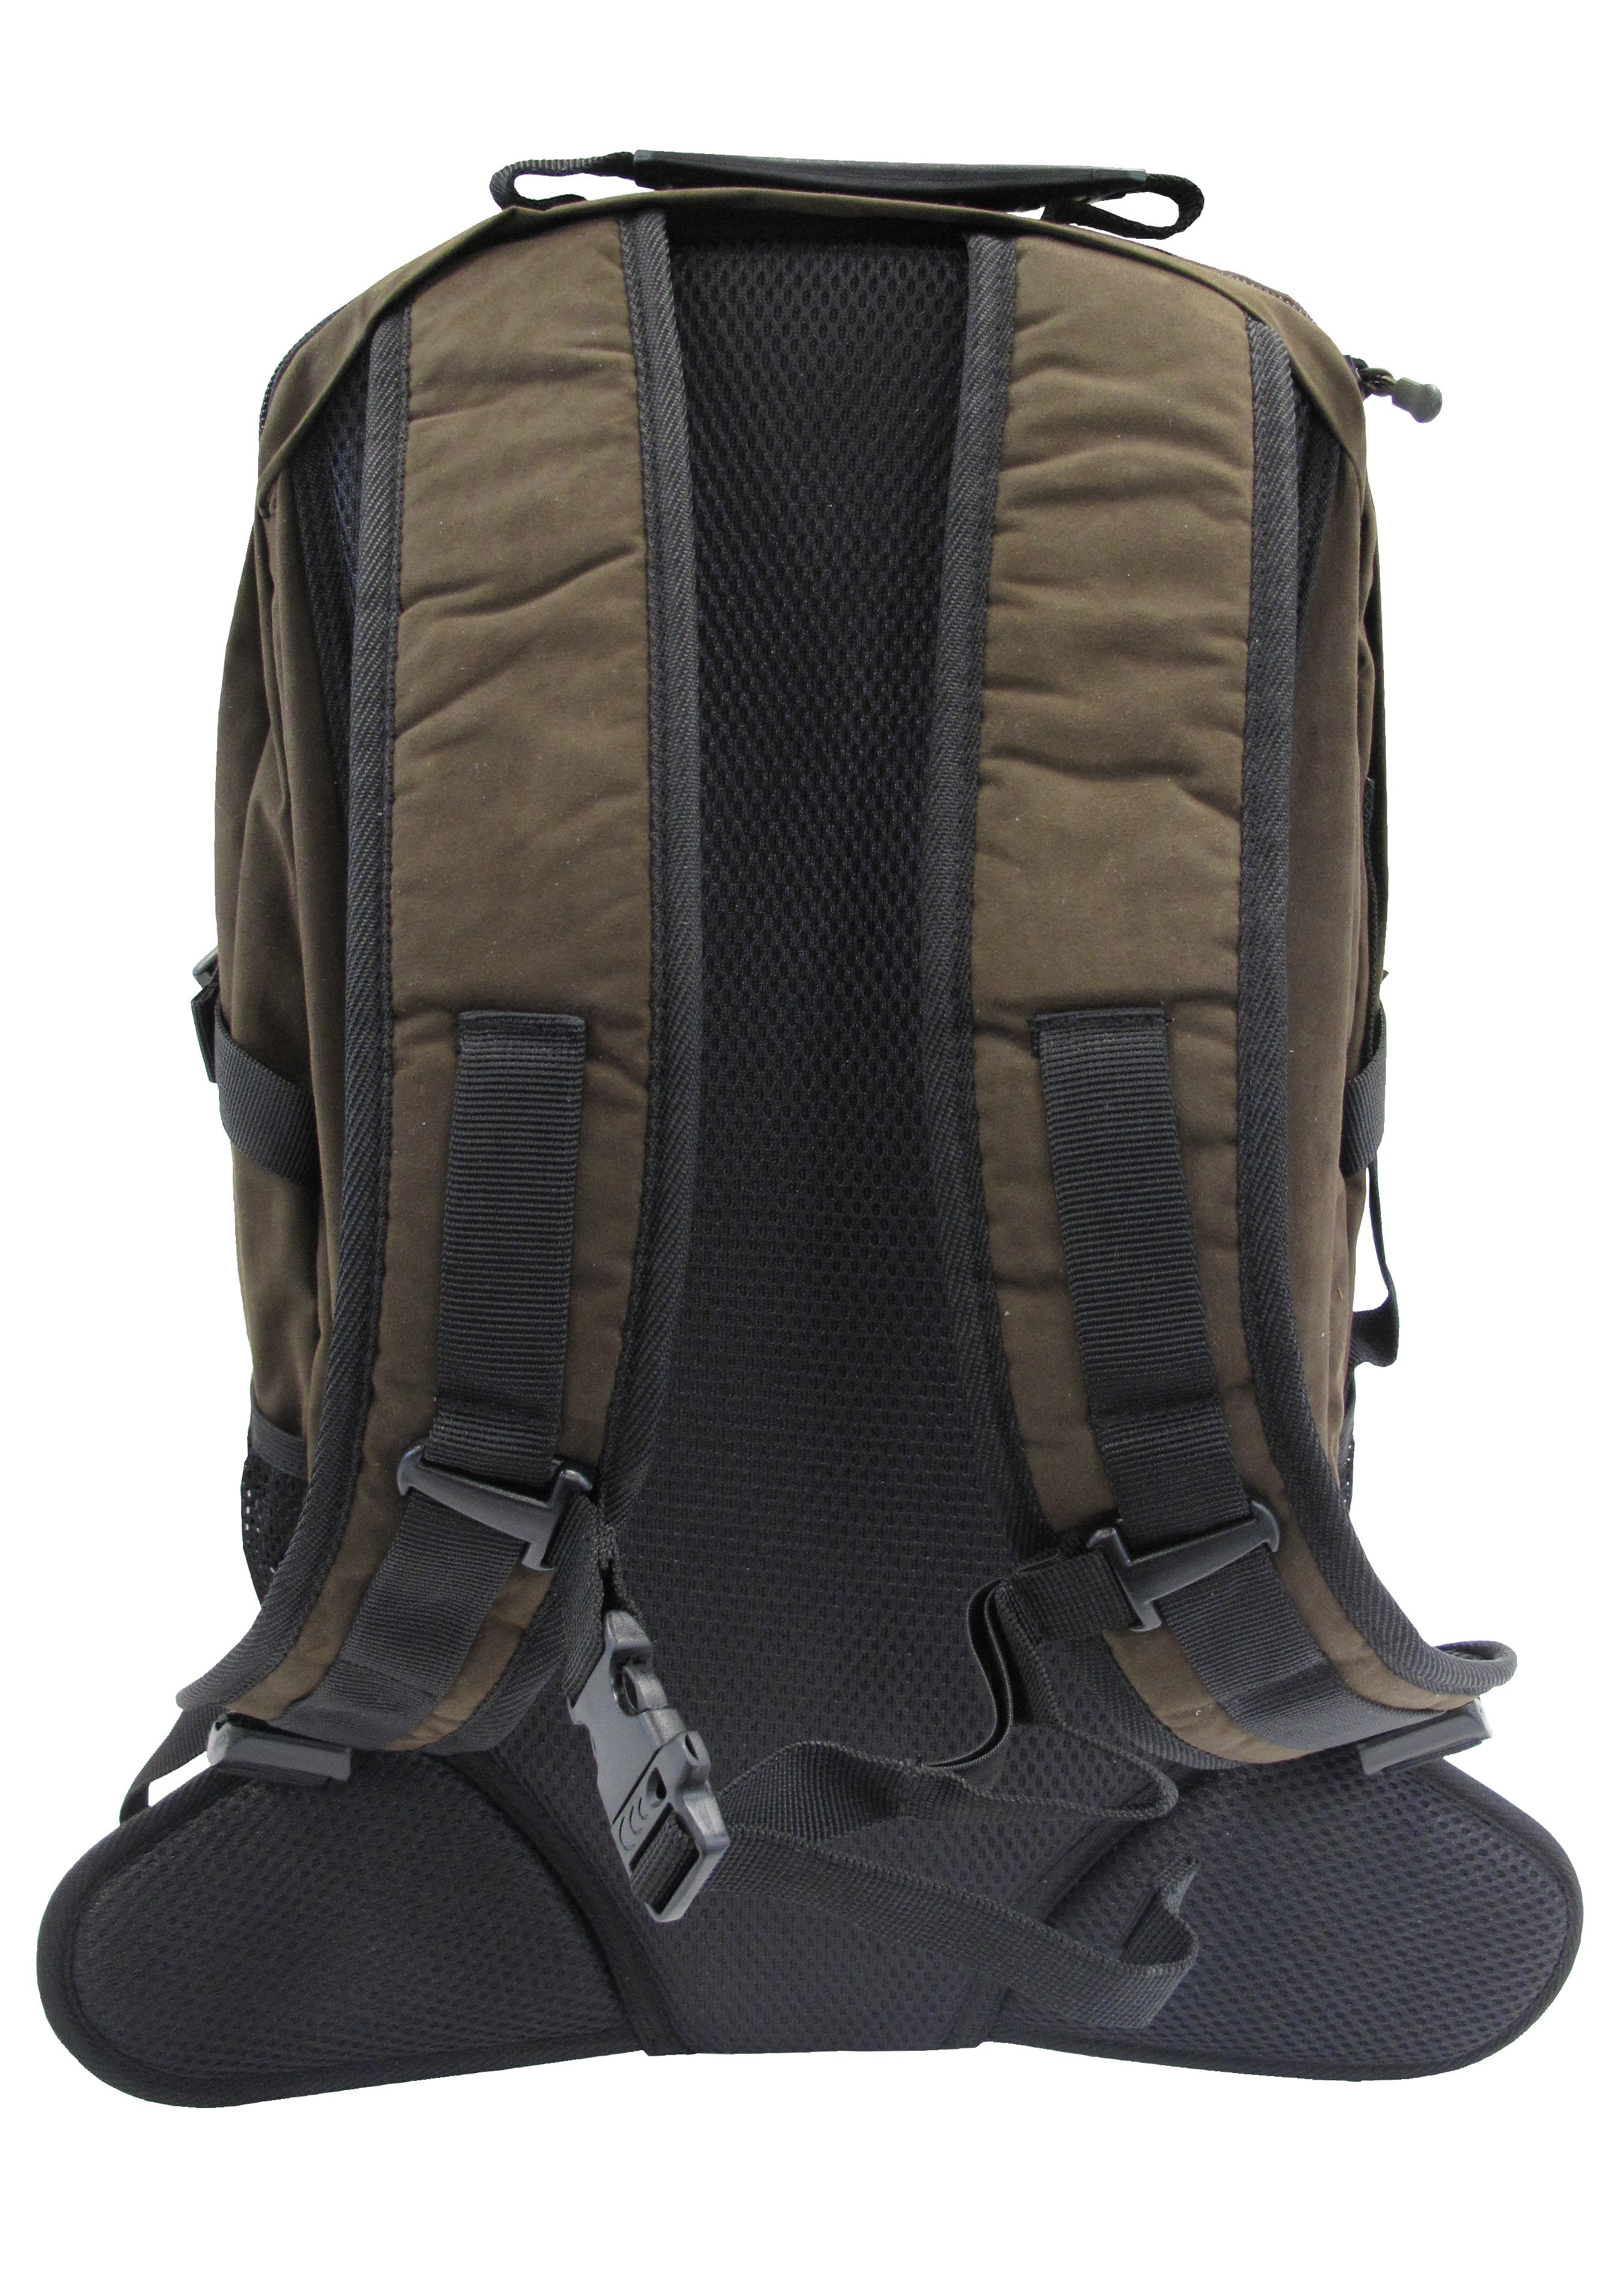 Pinewood Jagd-Rucksack mit Gewehrfutteral 209540 3